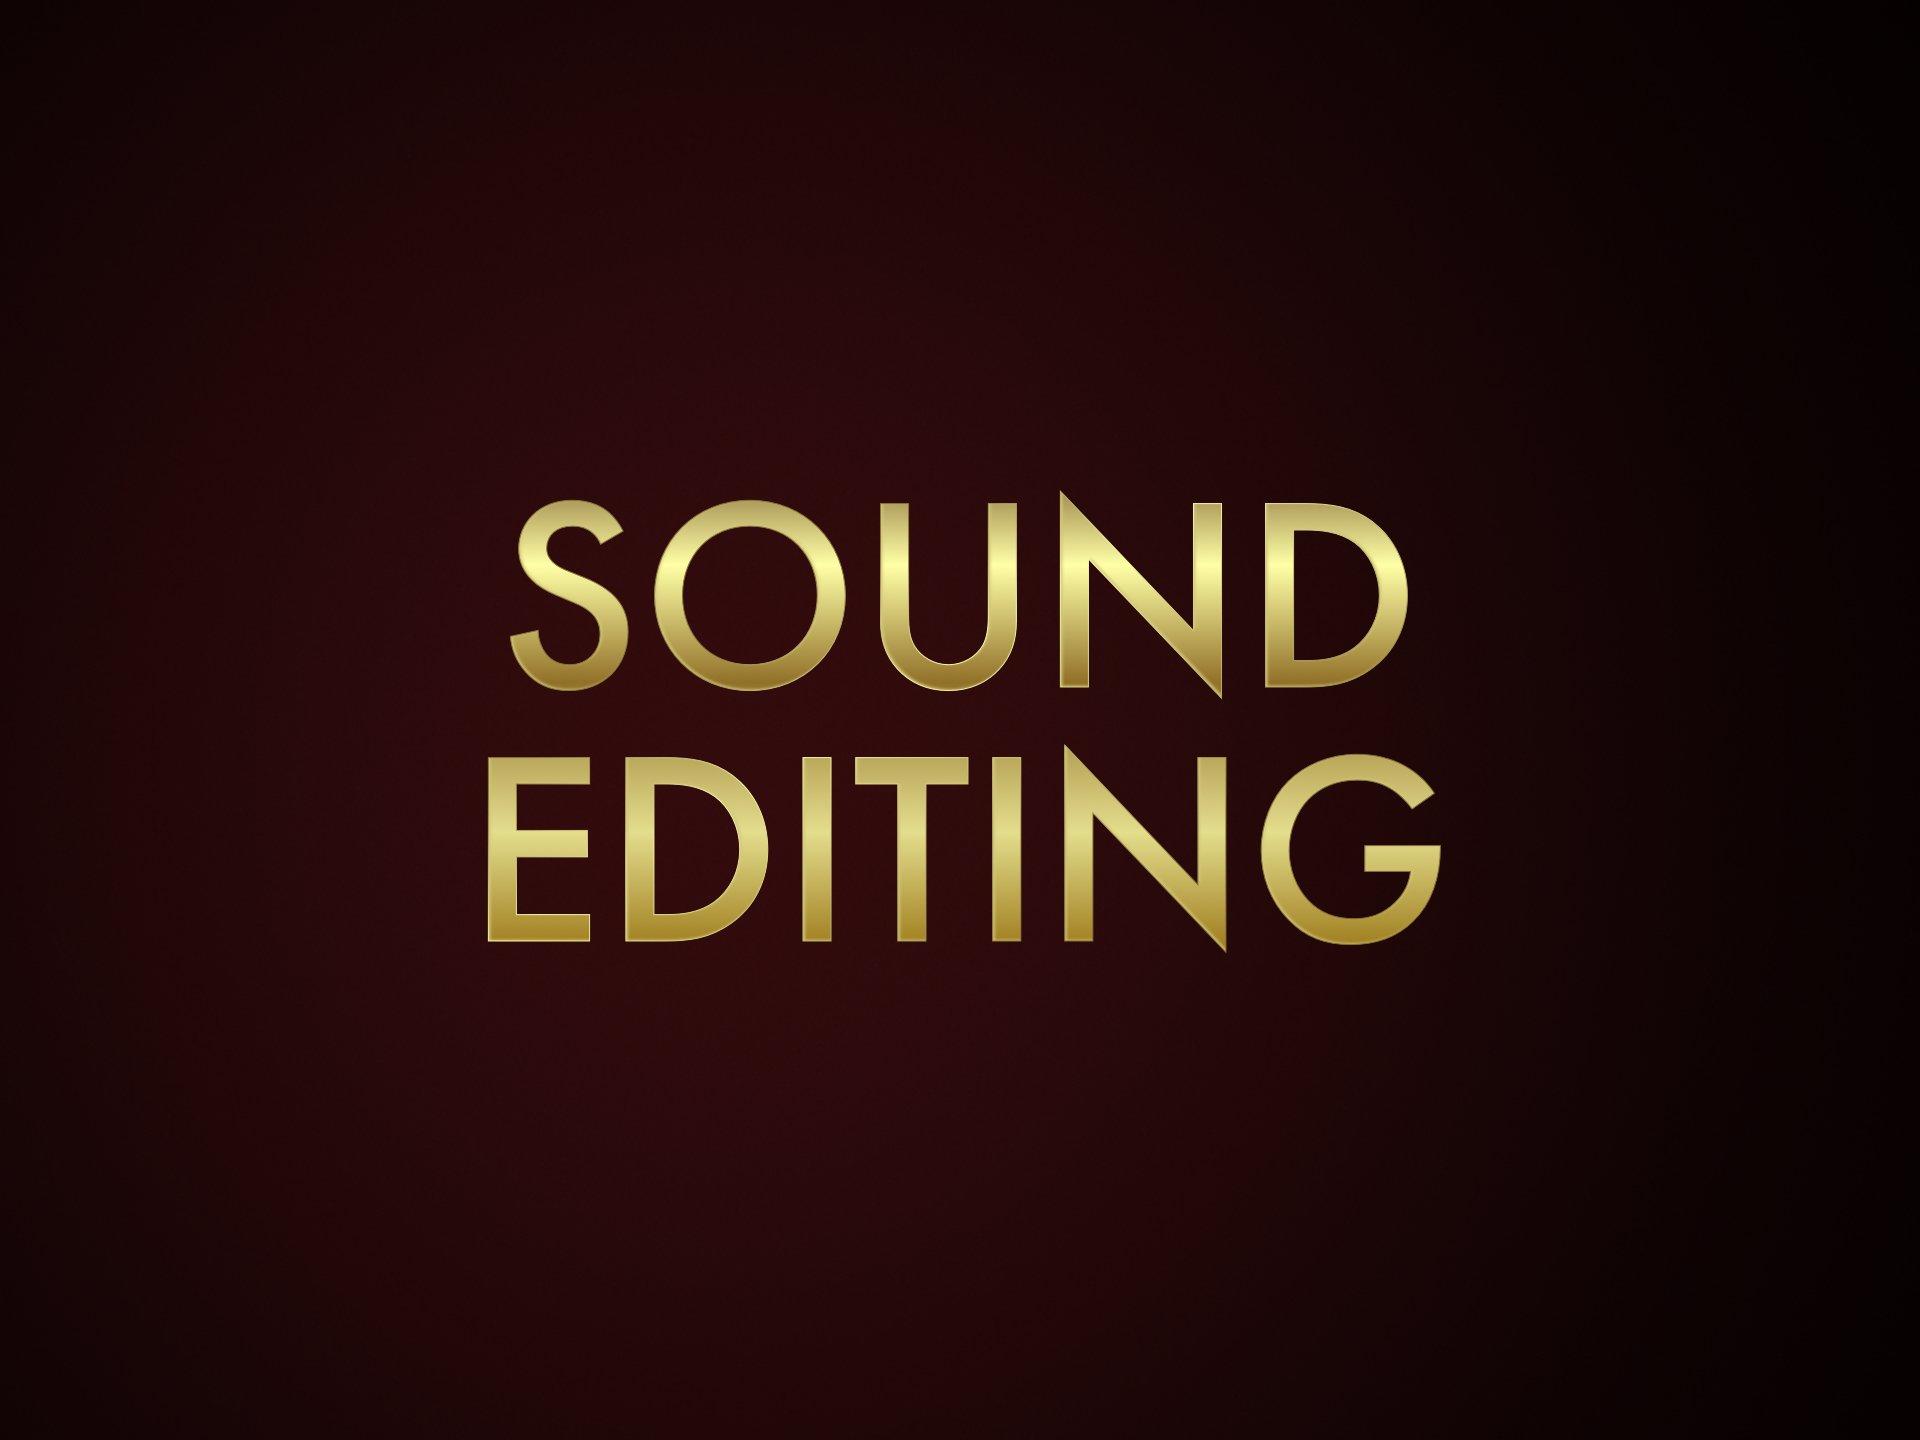 Sound Editing Oscar Nominations 2020   Oscars 2020 News 92nd 1920x1440